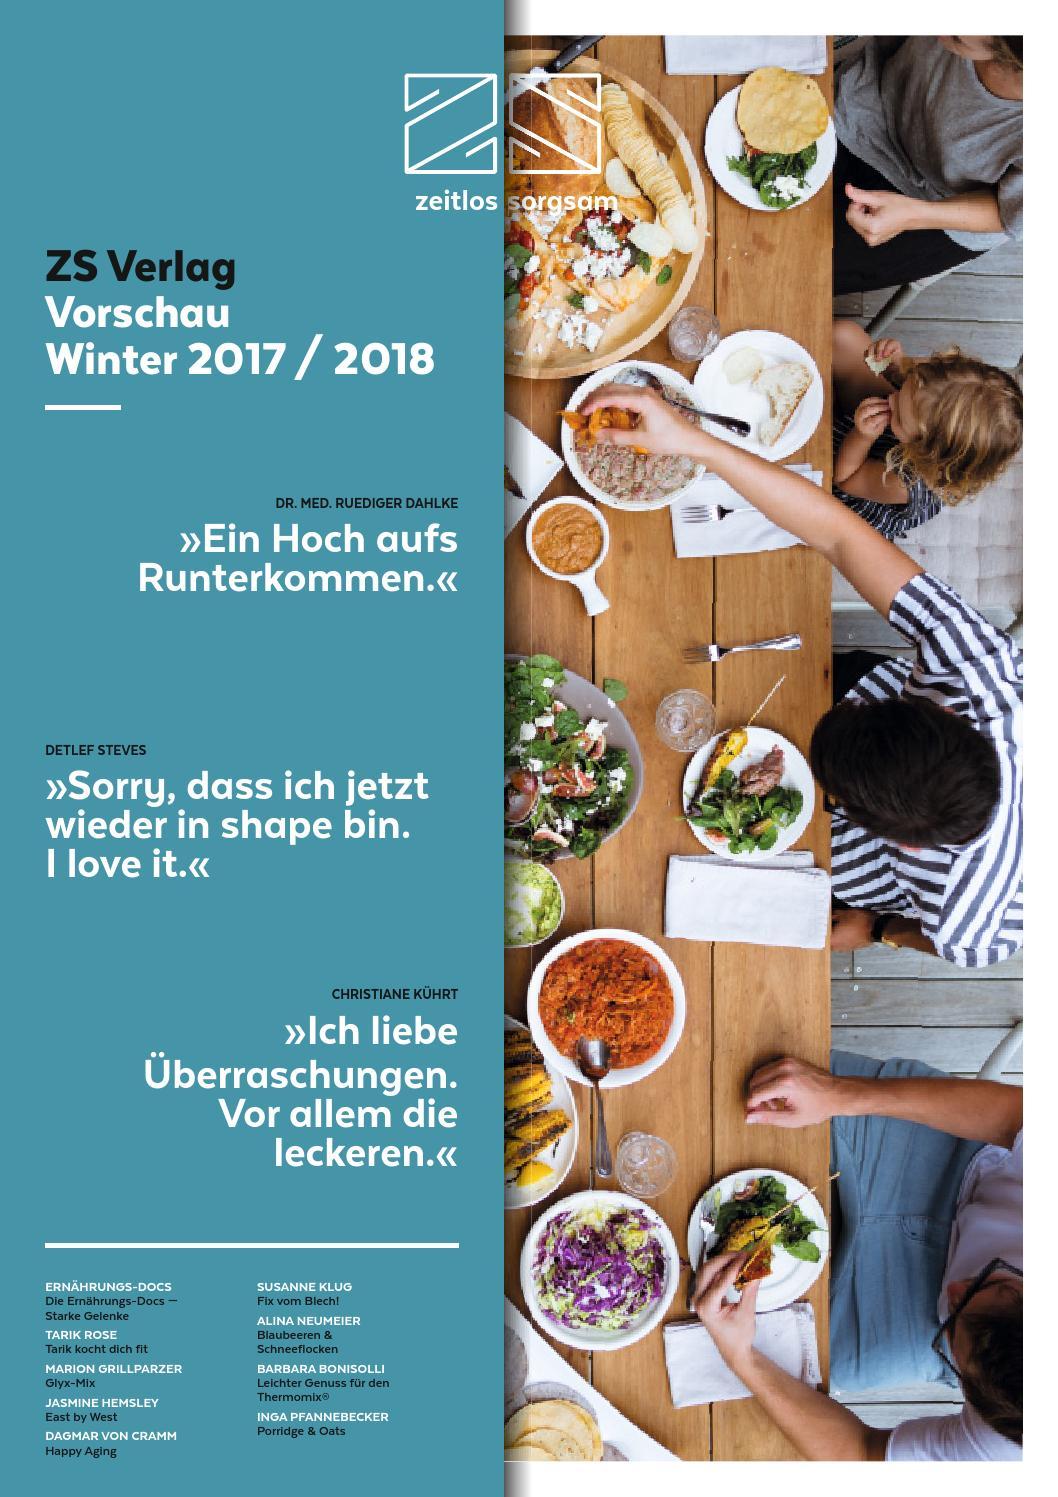 Marions Kochbuch Weihnachtsplätzchen.Zs Verlag Vorschau Winter 2017 2018 By Edelverlagsgruppe Issuu